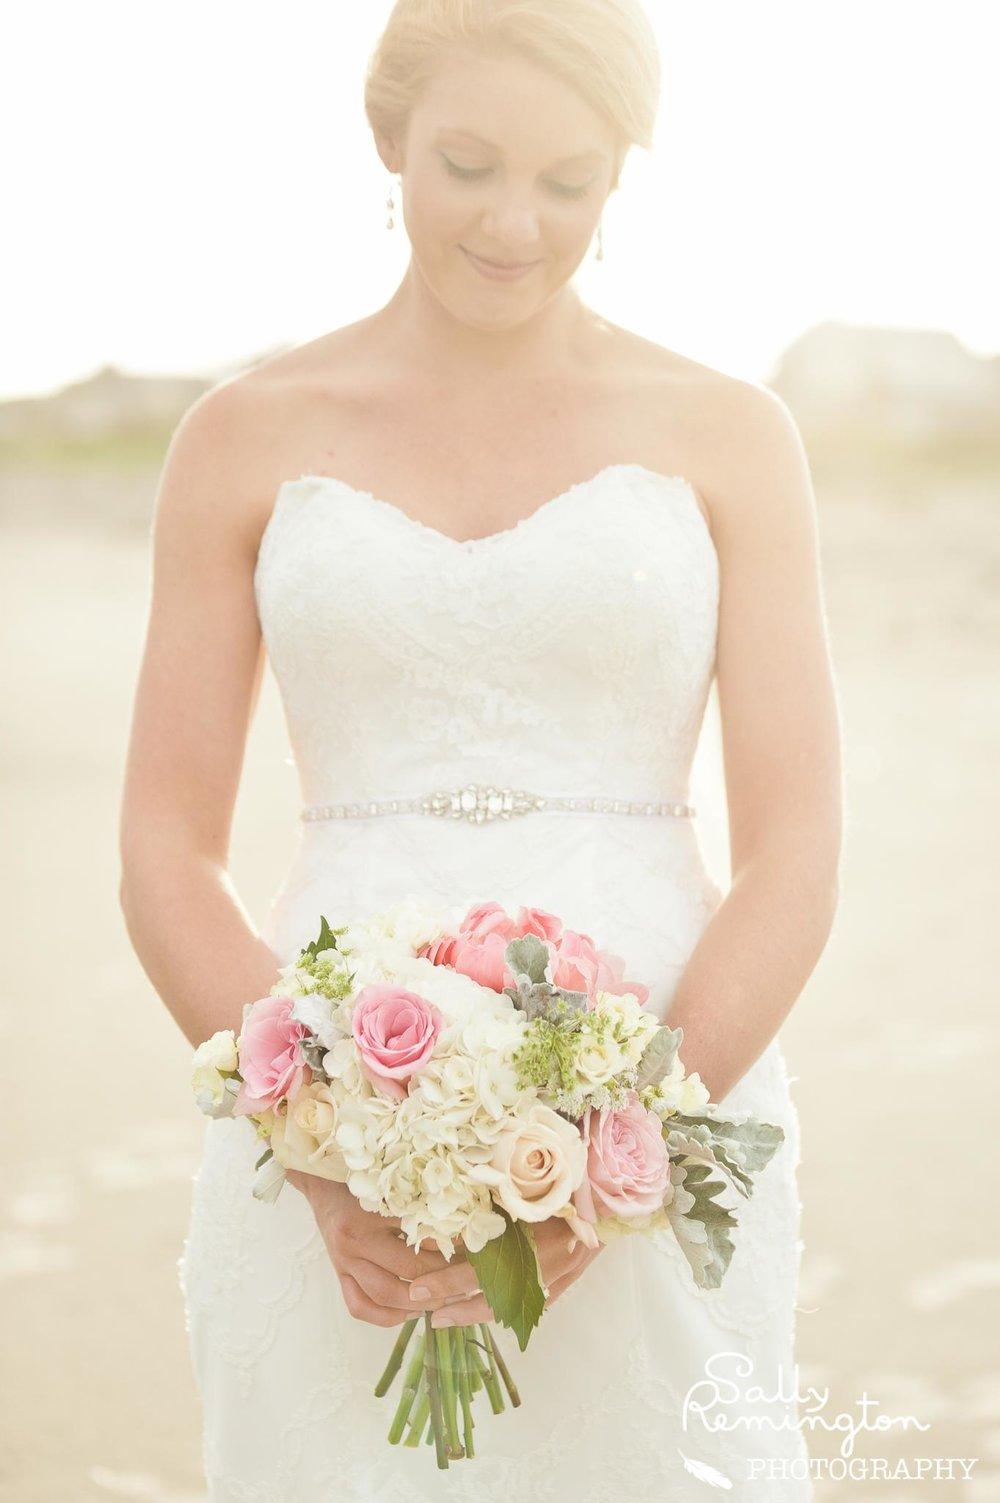 ivory-and-beau-bridal-boutique-savannah-wedding-dress-savannah-wedding-gown-kirstie-maggie-sottero-real-maggie-sottero-bride-beach-wedding-sarah-remington-photography-5.jpg